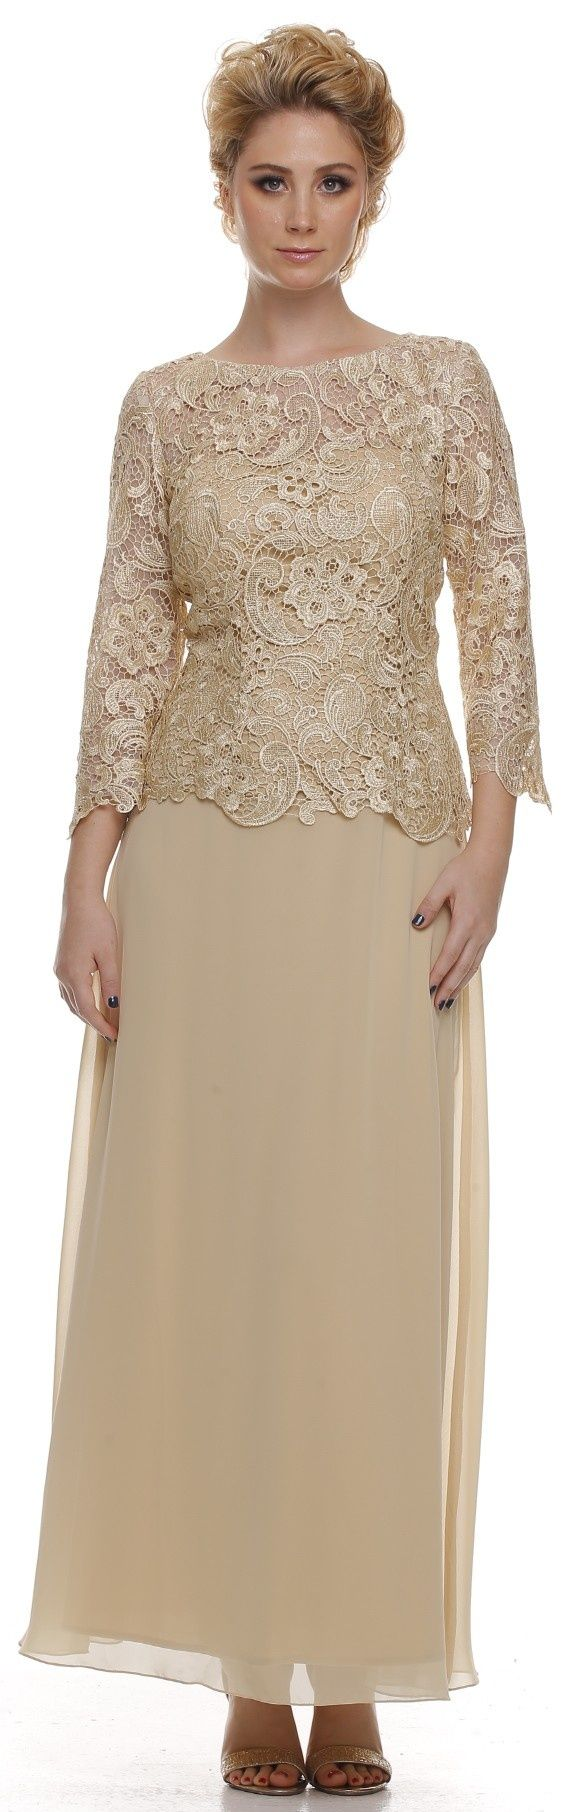 best dress images on pinterest bride dresses mob dresses and